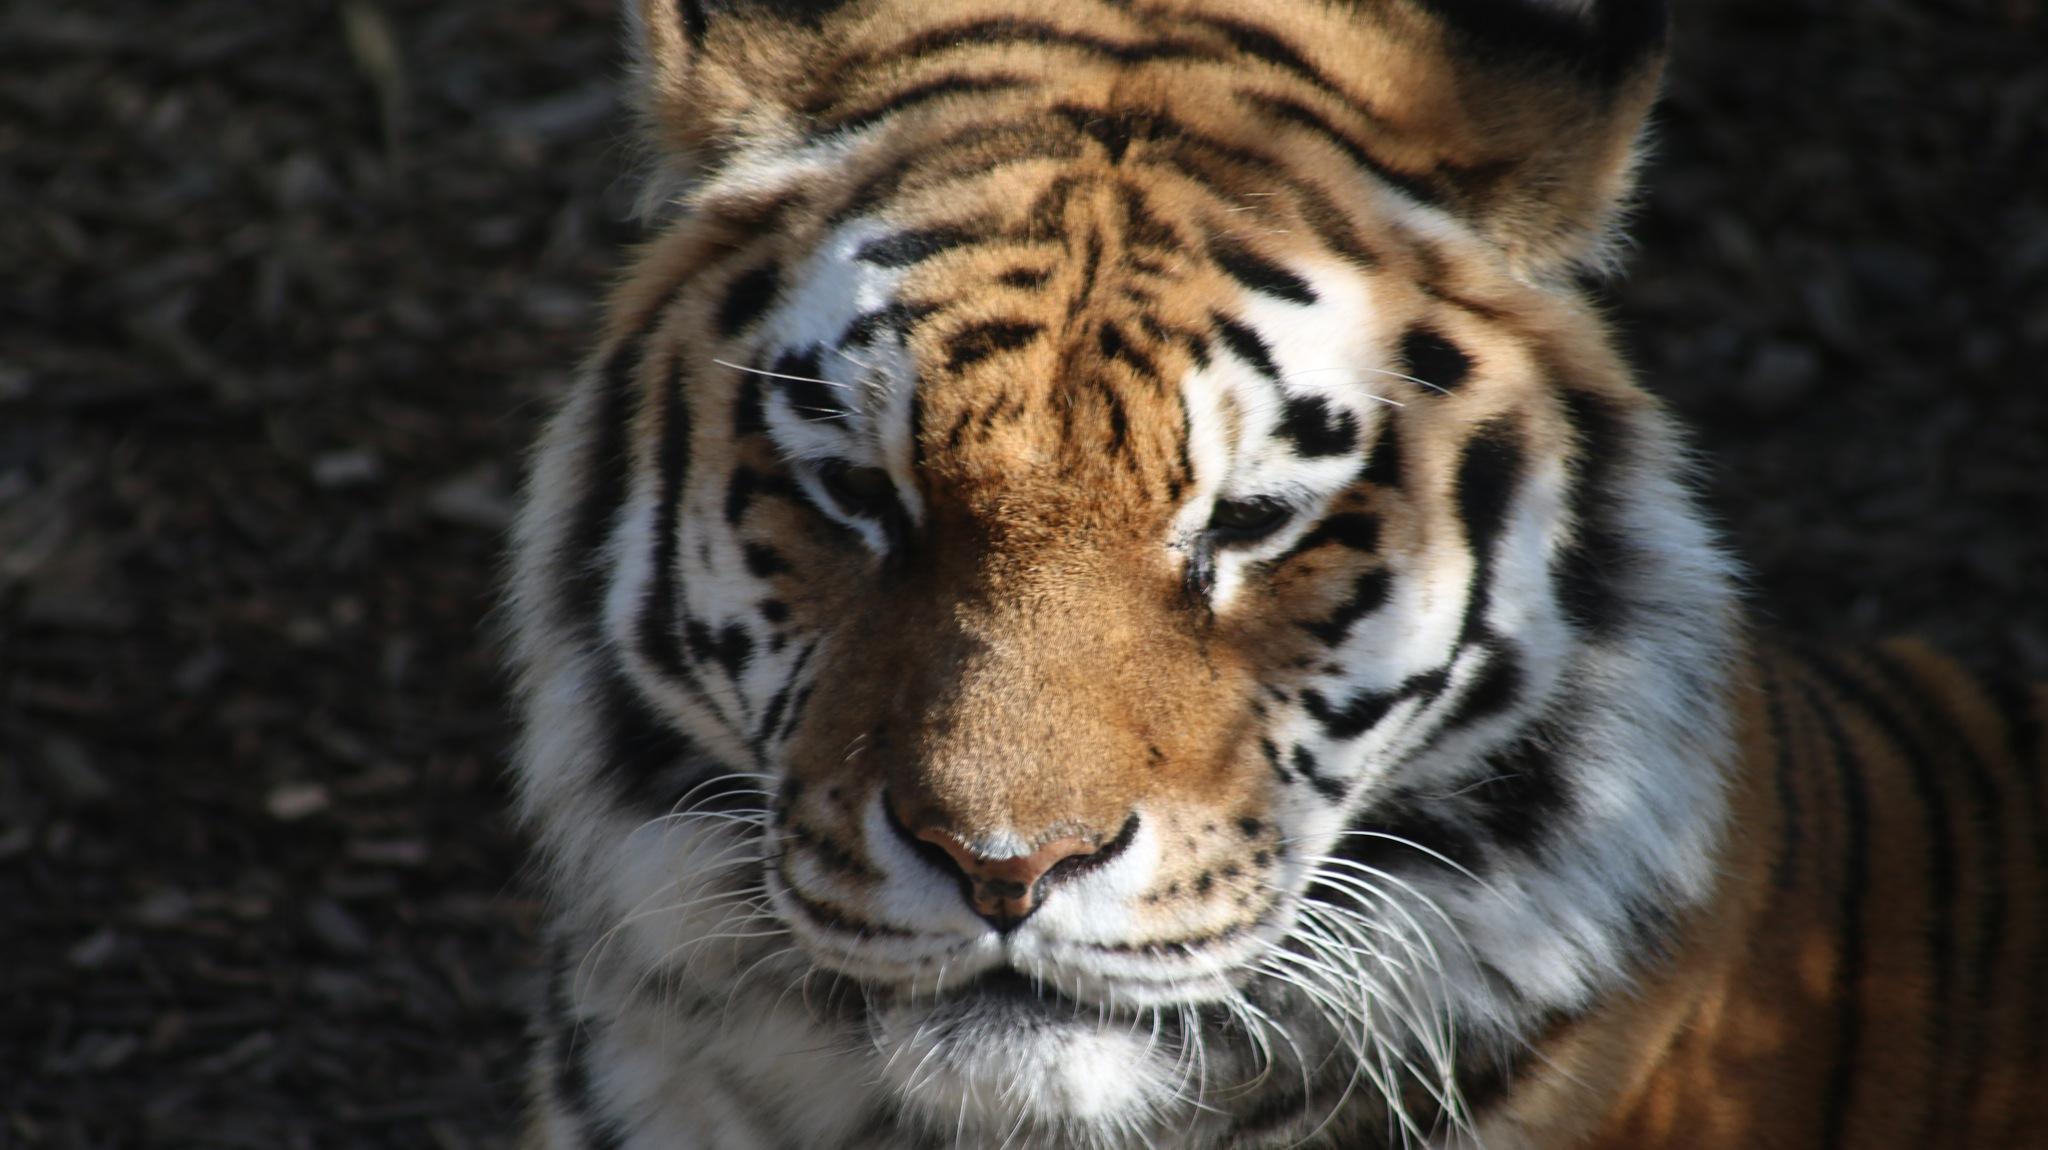 Tiger by Josephine